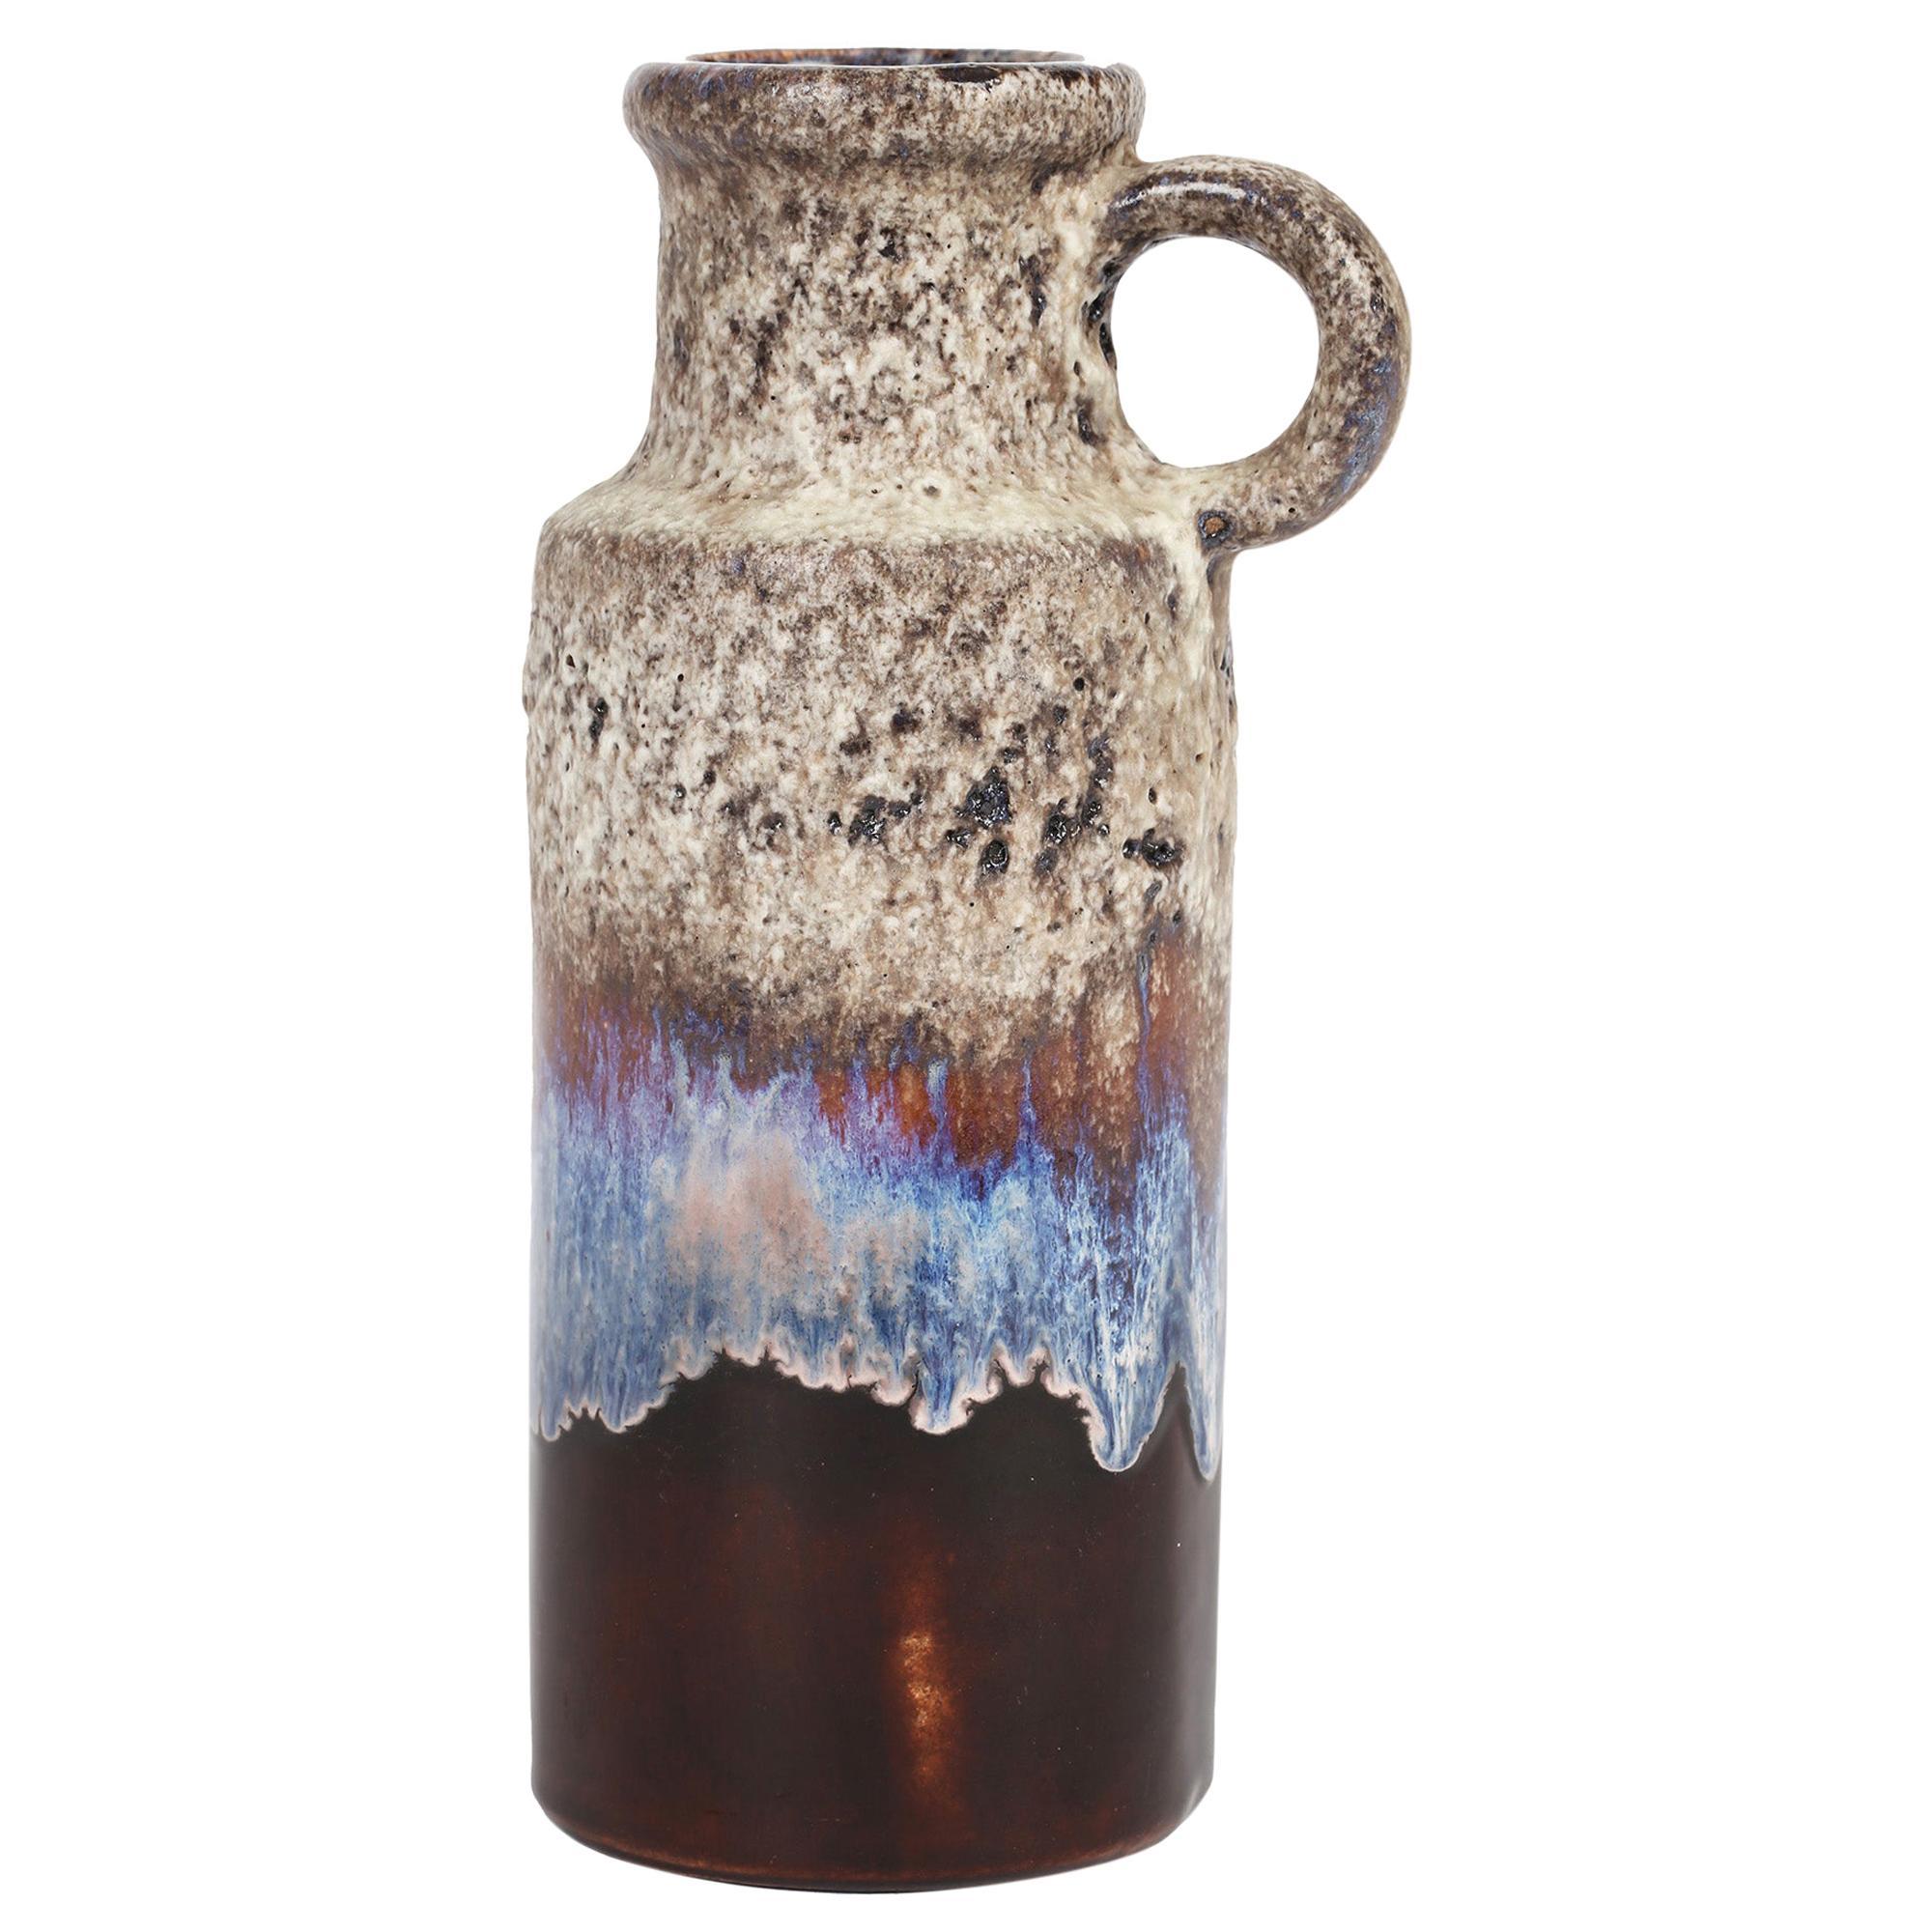 Scheurich Mid-Century West German Flagon Shaped Art Pottery Handled Vase